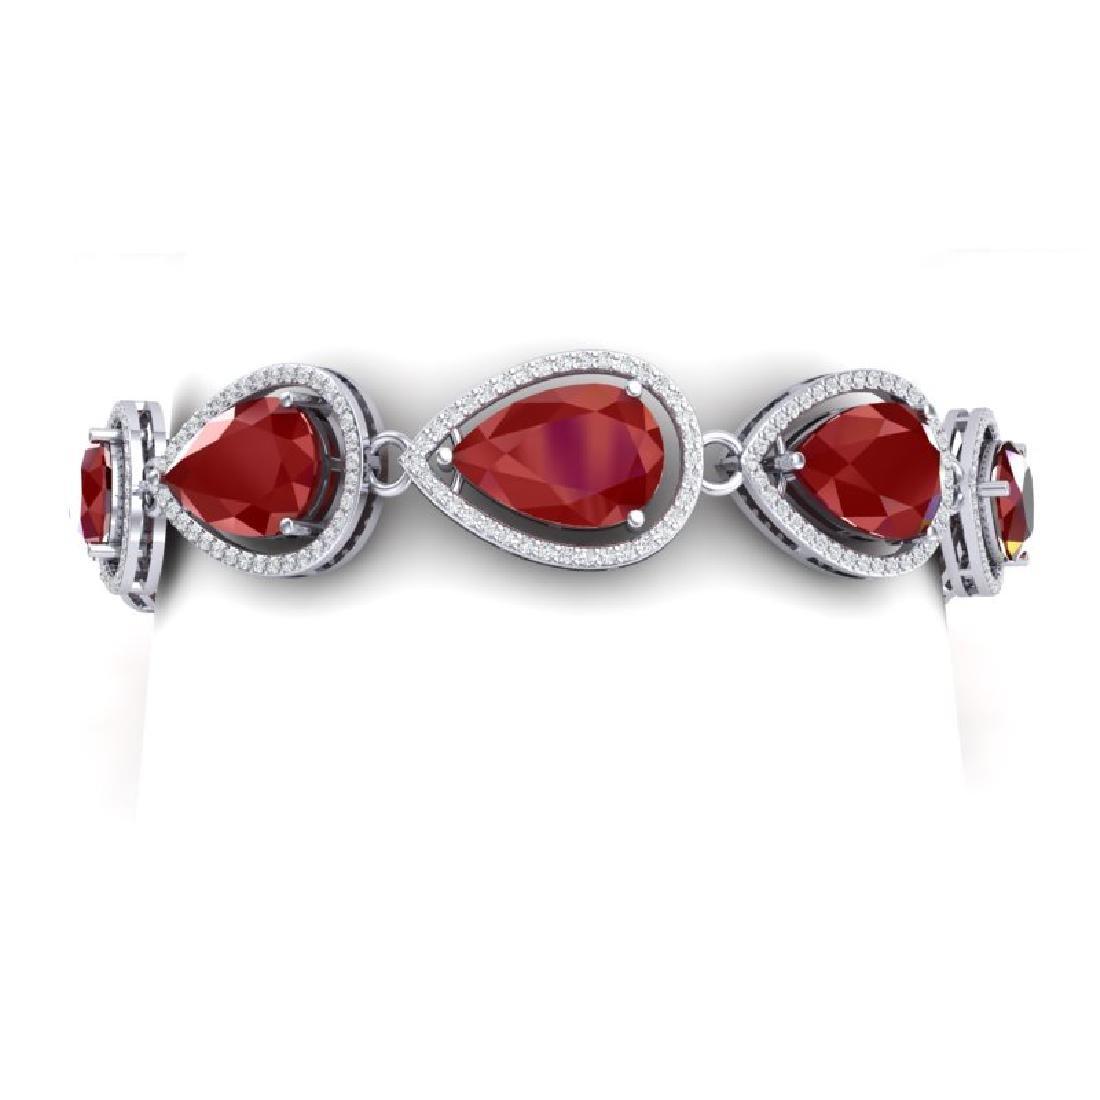 28.31 CTW Royalty Ruby & VS Diamond Bracelet 18K White